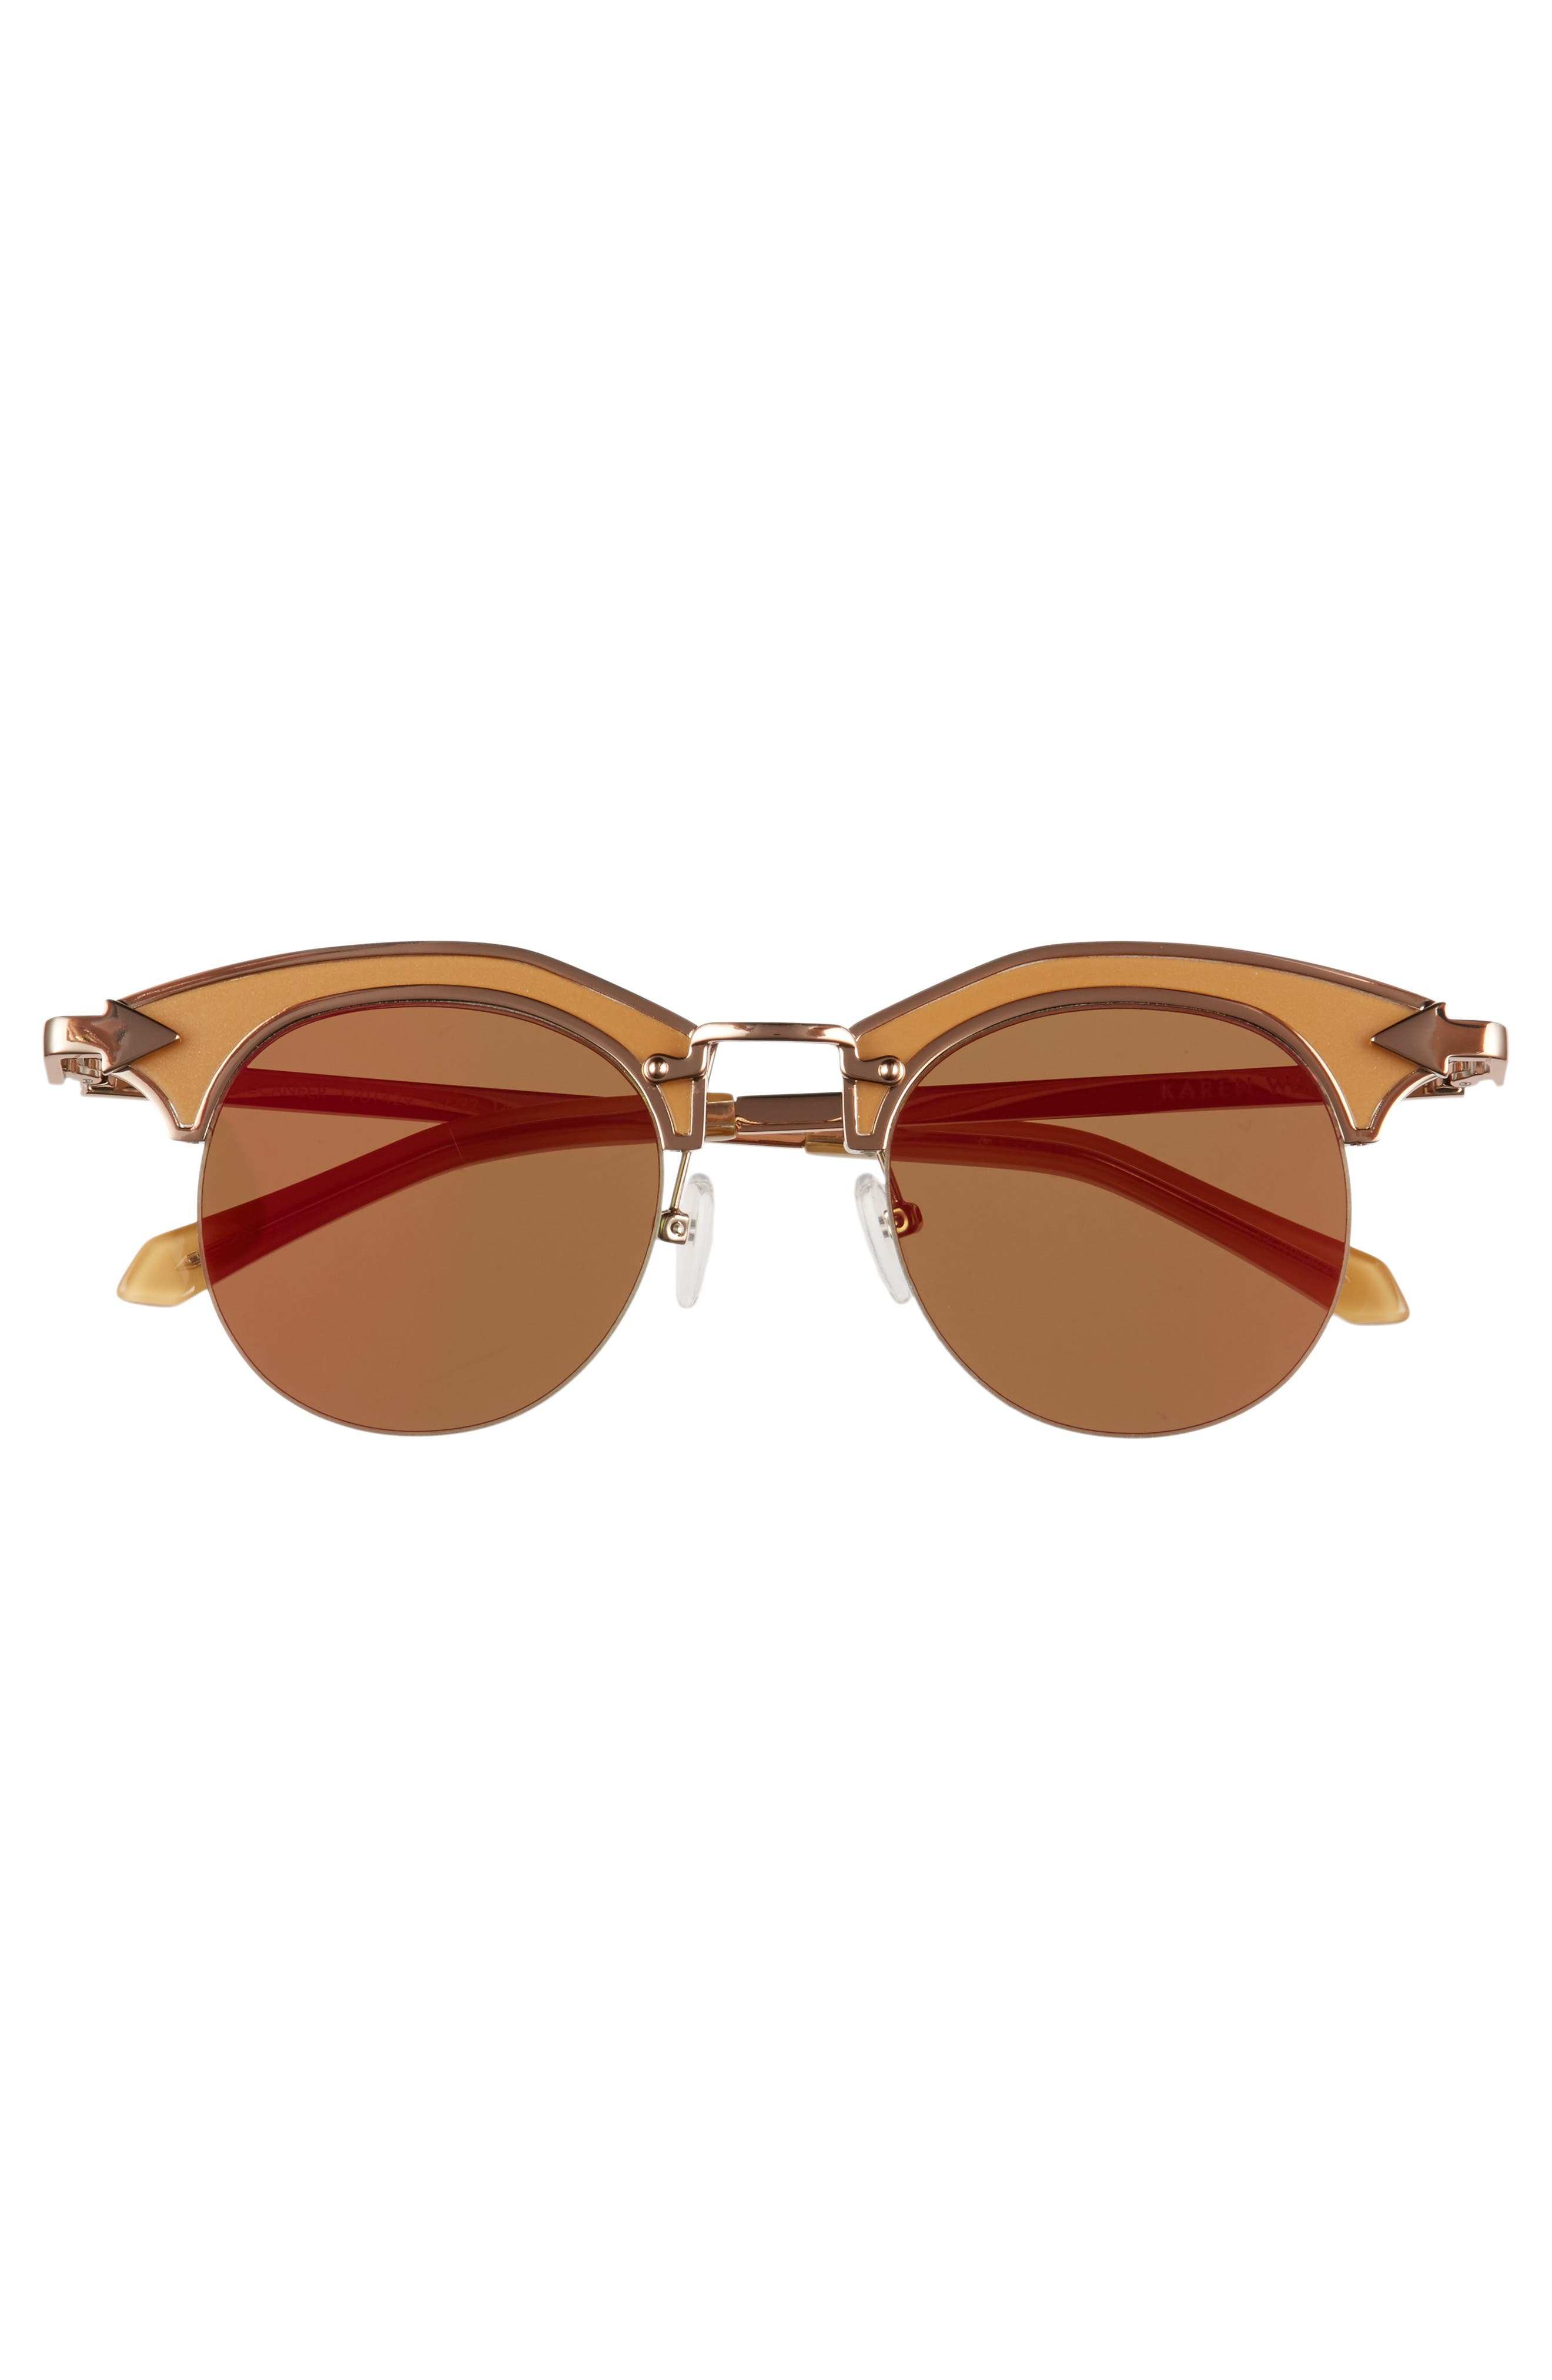 Buccaneer 47mm Round Sunglasses,                             Alternate thumbnail 9, color,